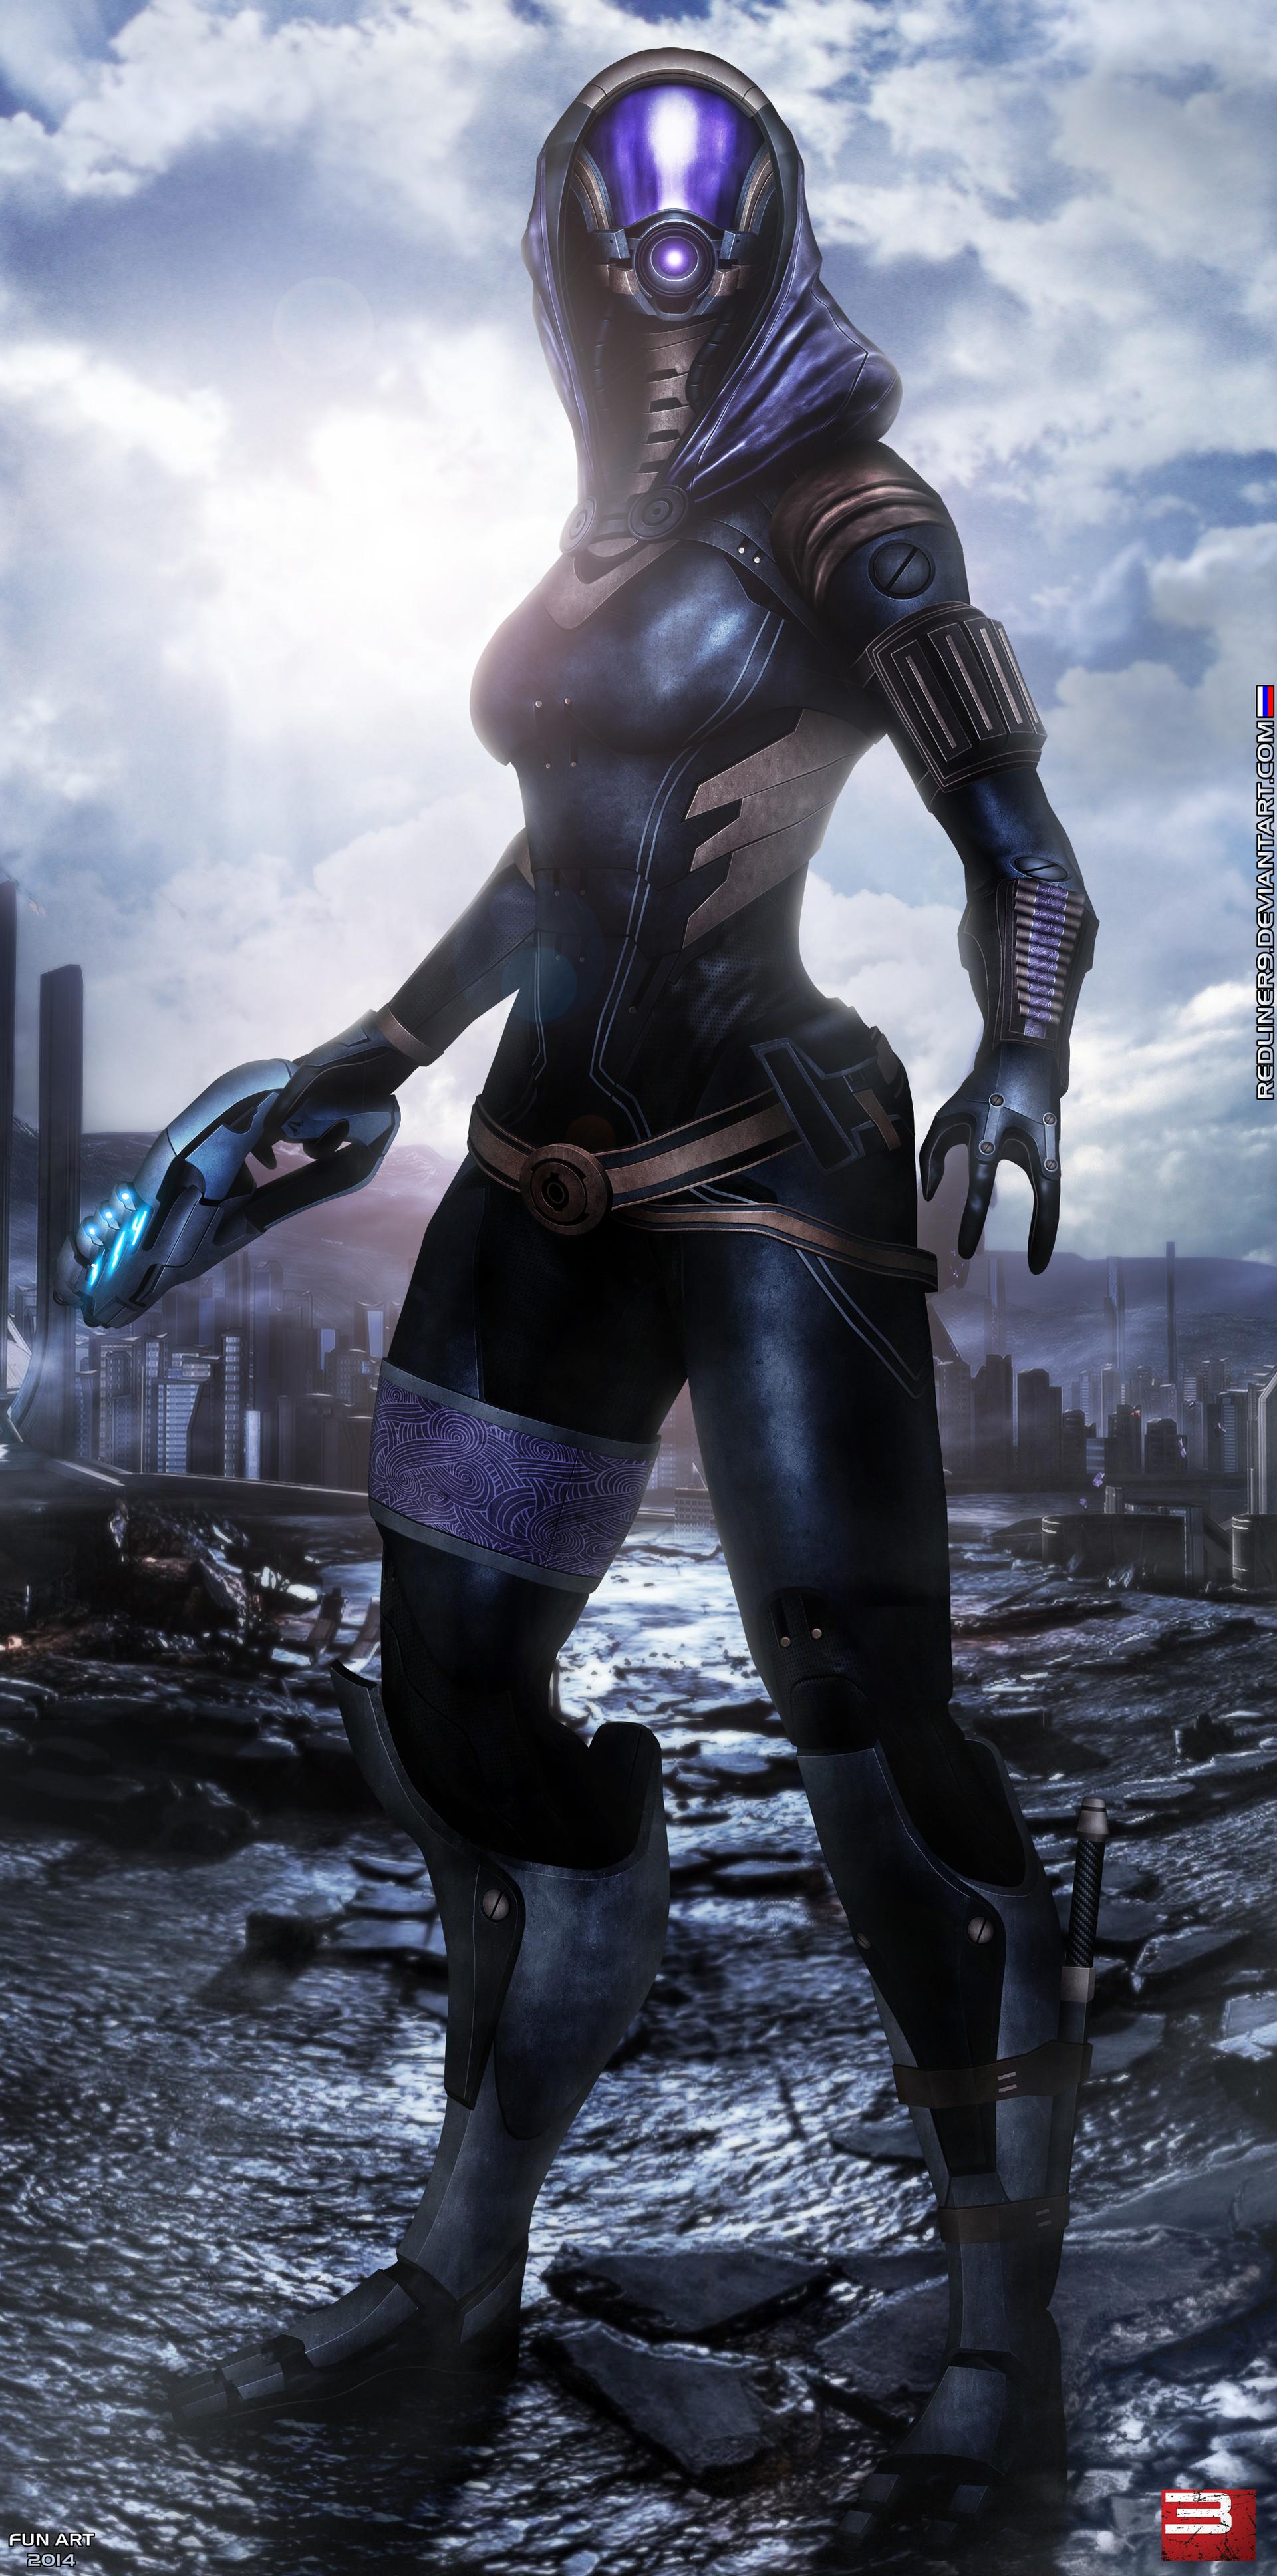 Mass Effect 3 Tali'Zorah (2014) by Alexander Krasnov